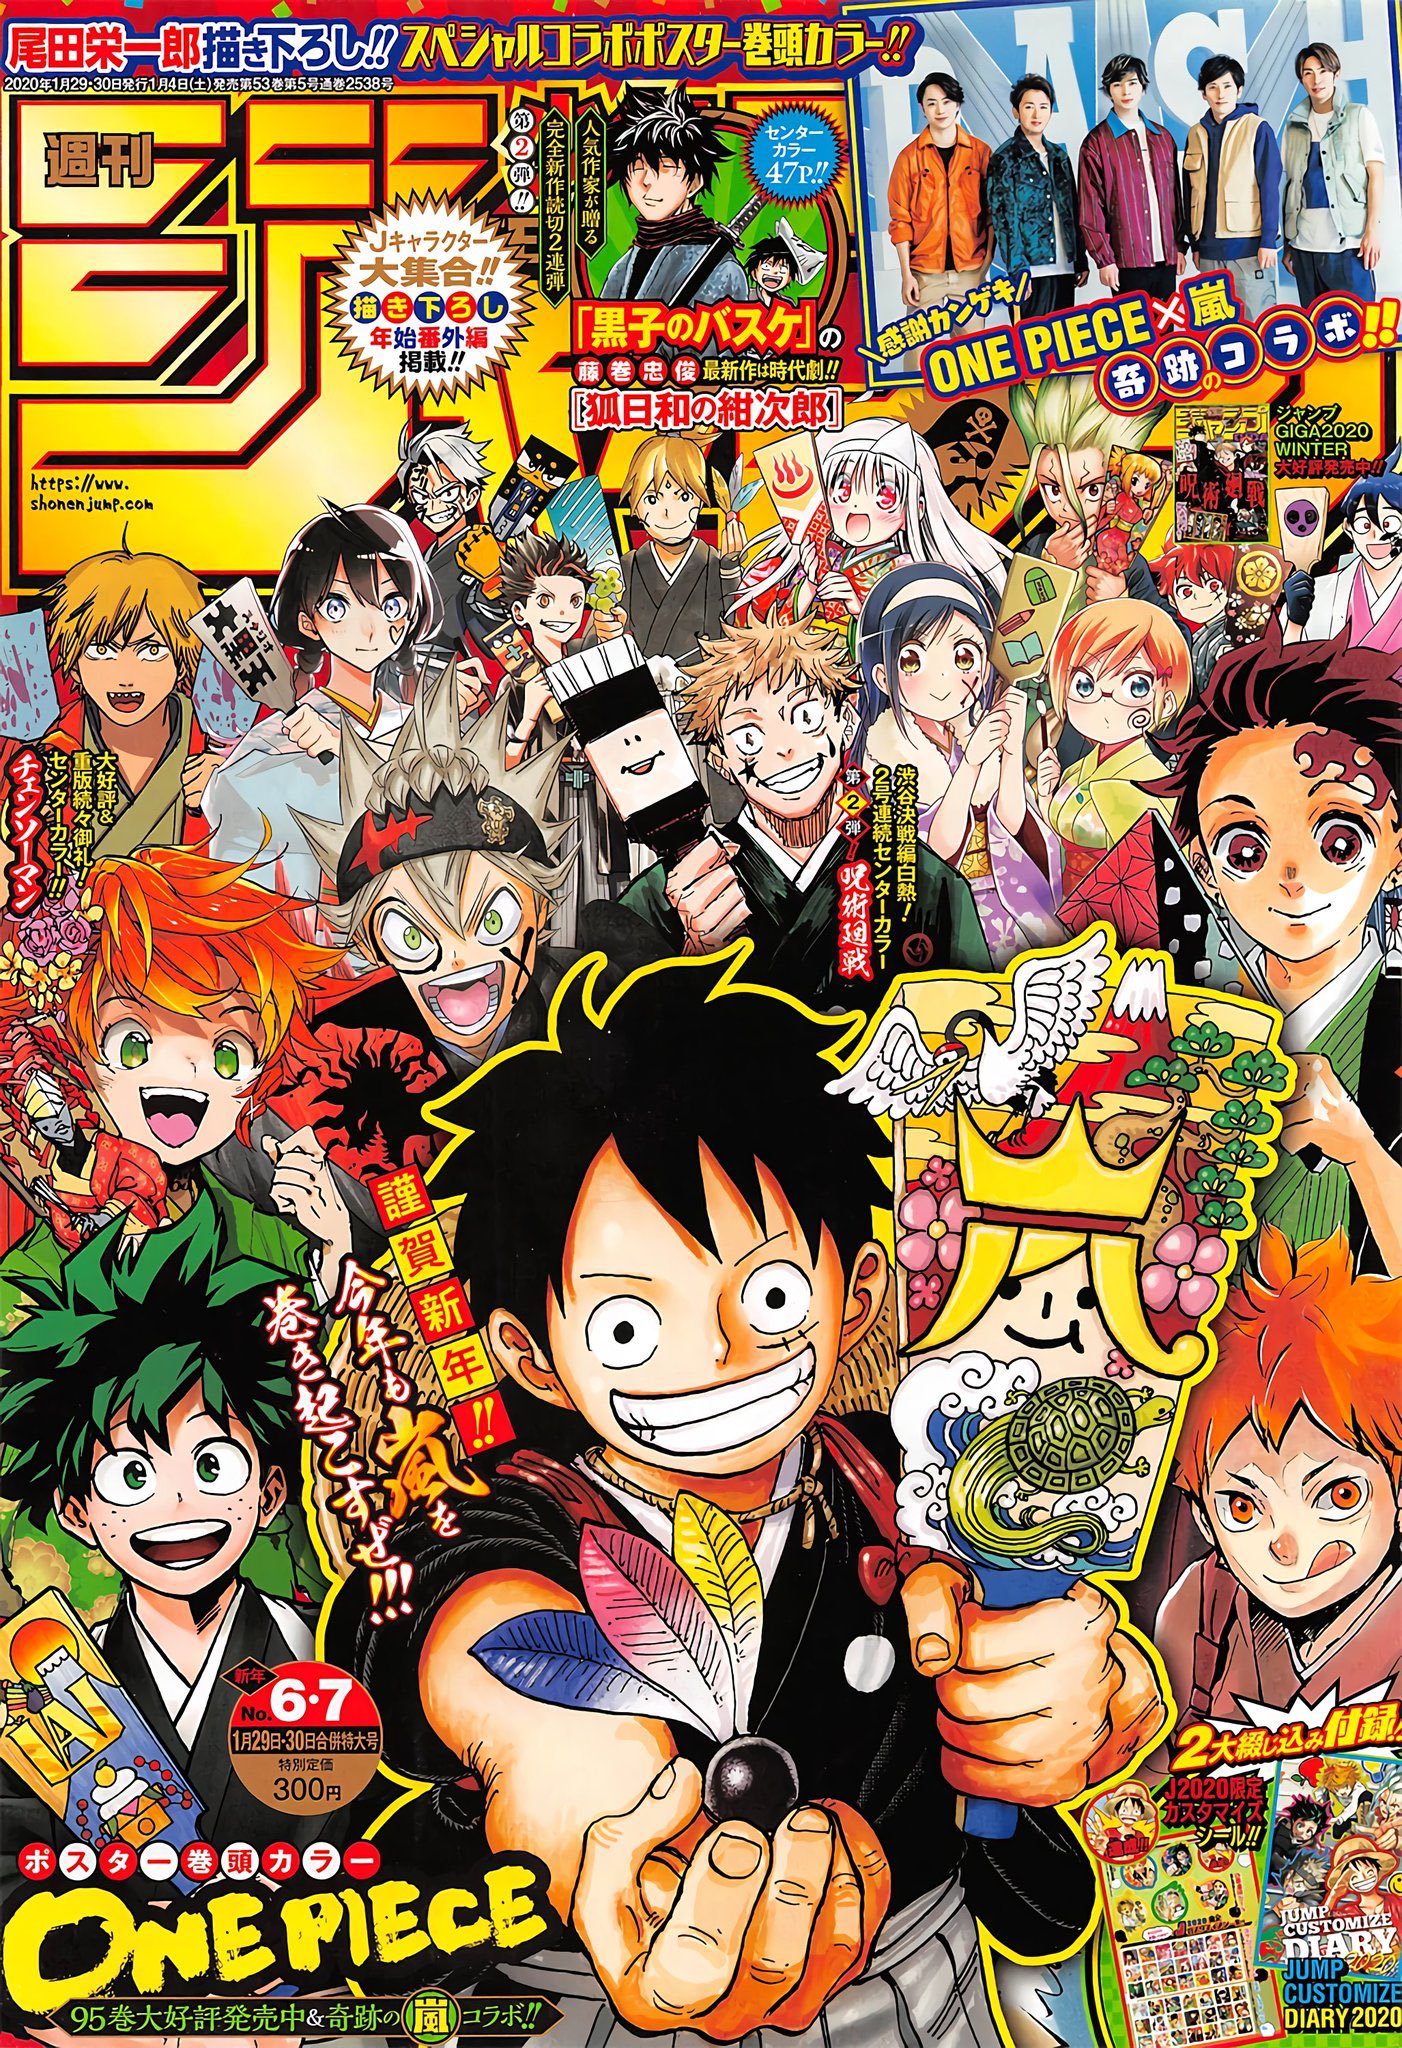 Jujutsu Kaisen On Twitter Yuji On The Cover Of Weekly Shonen Jump Issue 6 7